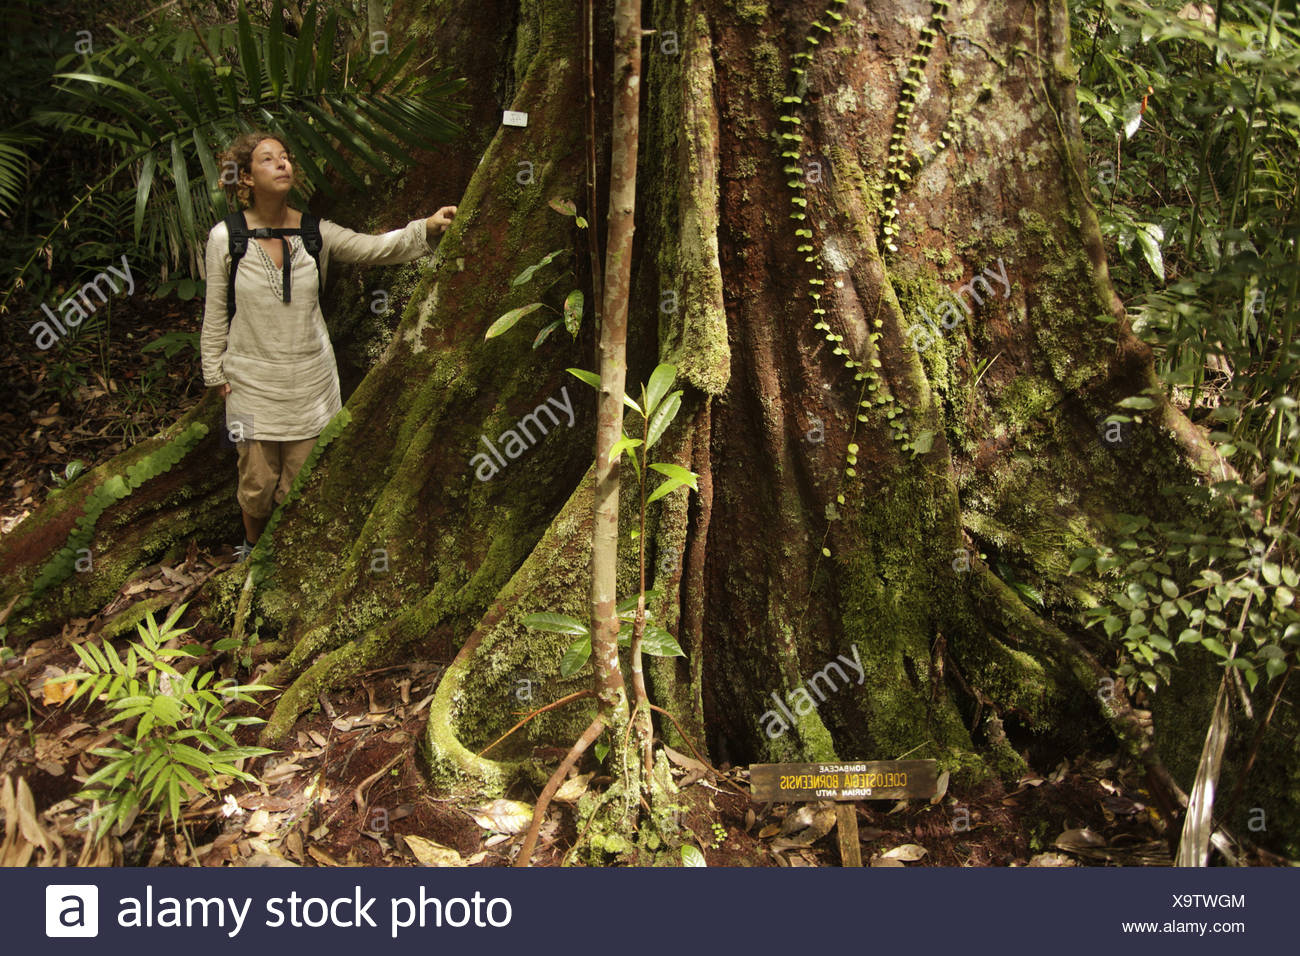 Tourist next to a giant rainforest tree in the Bako National Park near Kuching, Sarawak, Borneo, Malaysia, Southeast Asia - Stock Image